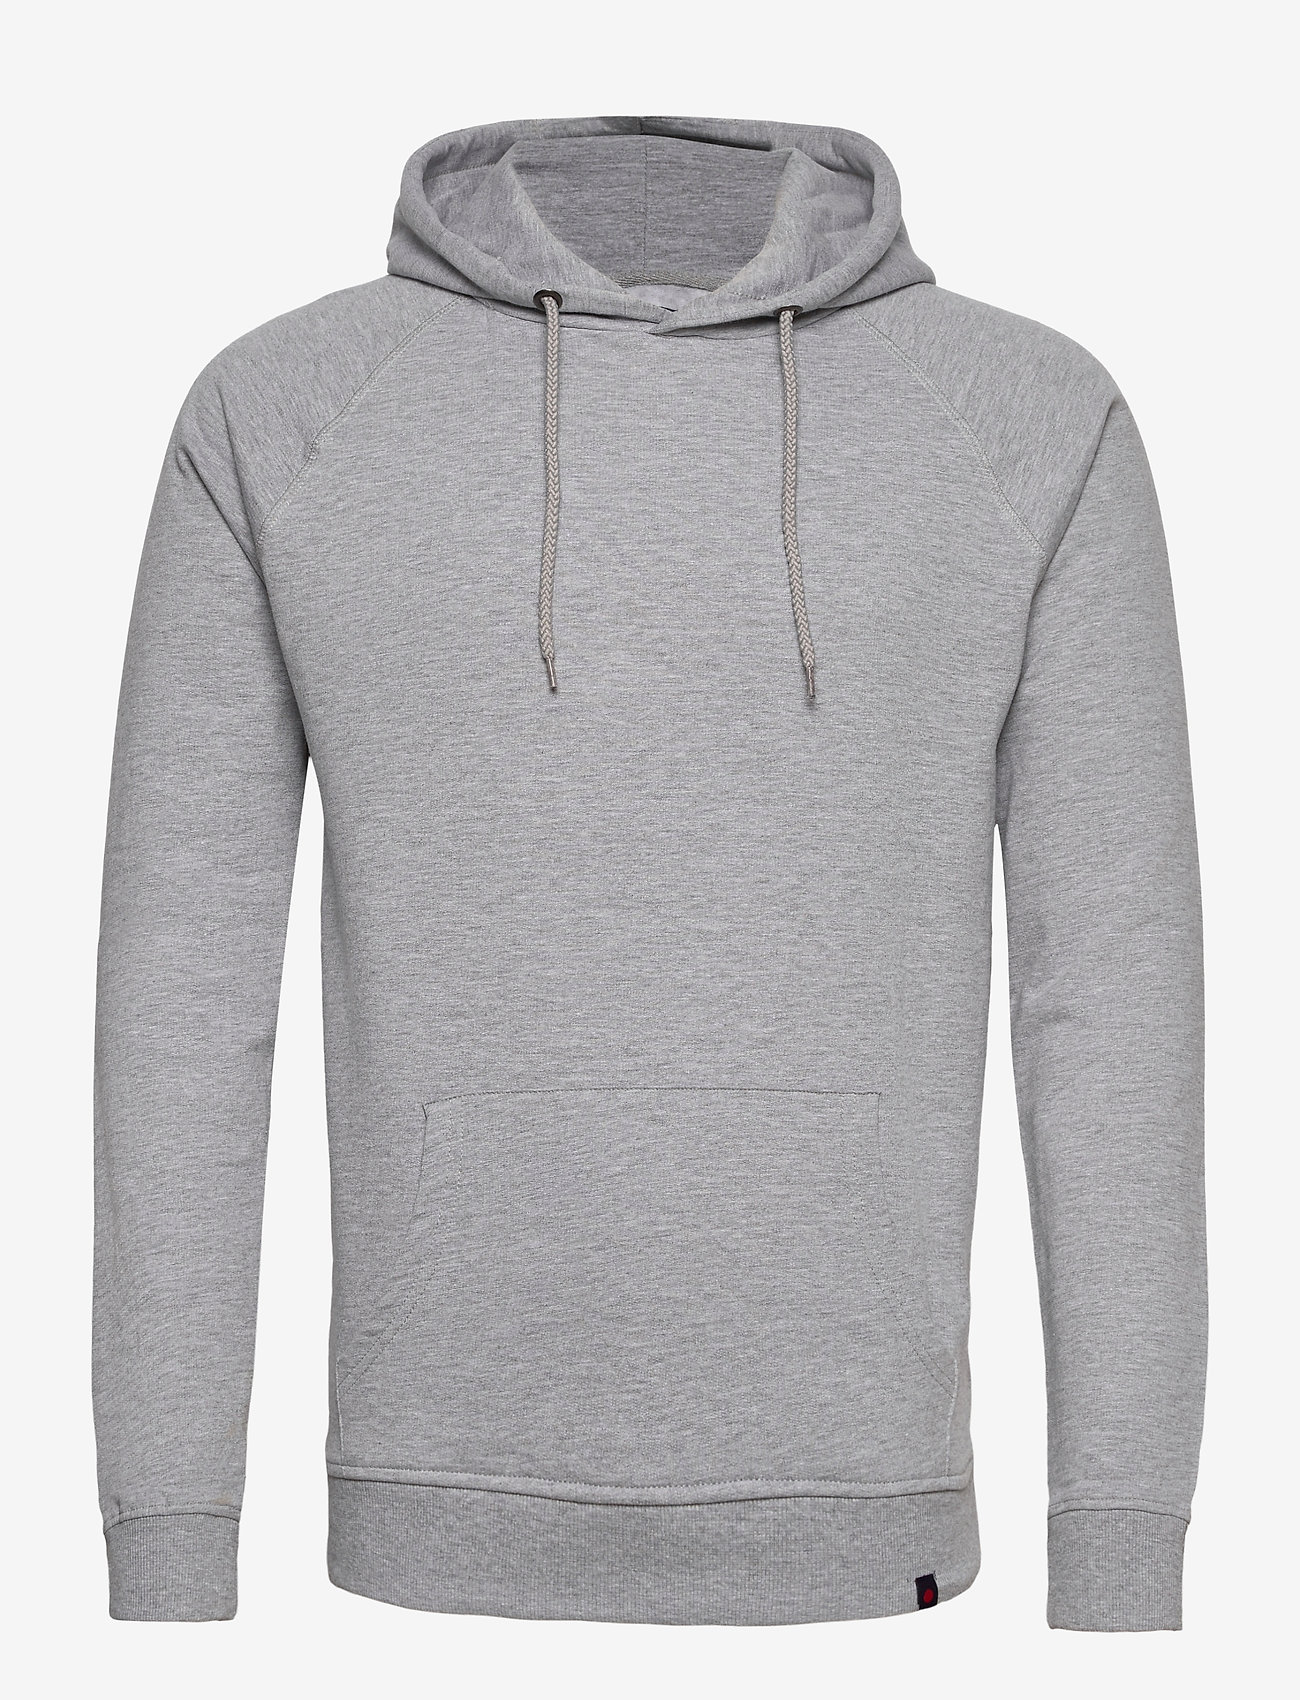 Denim project - BASIC SWEAT HOODIE - basic sweatshirts - 003 grey - 0